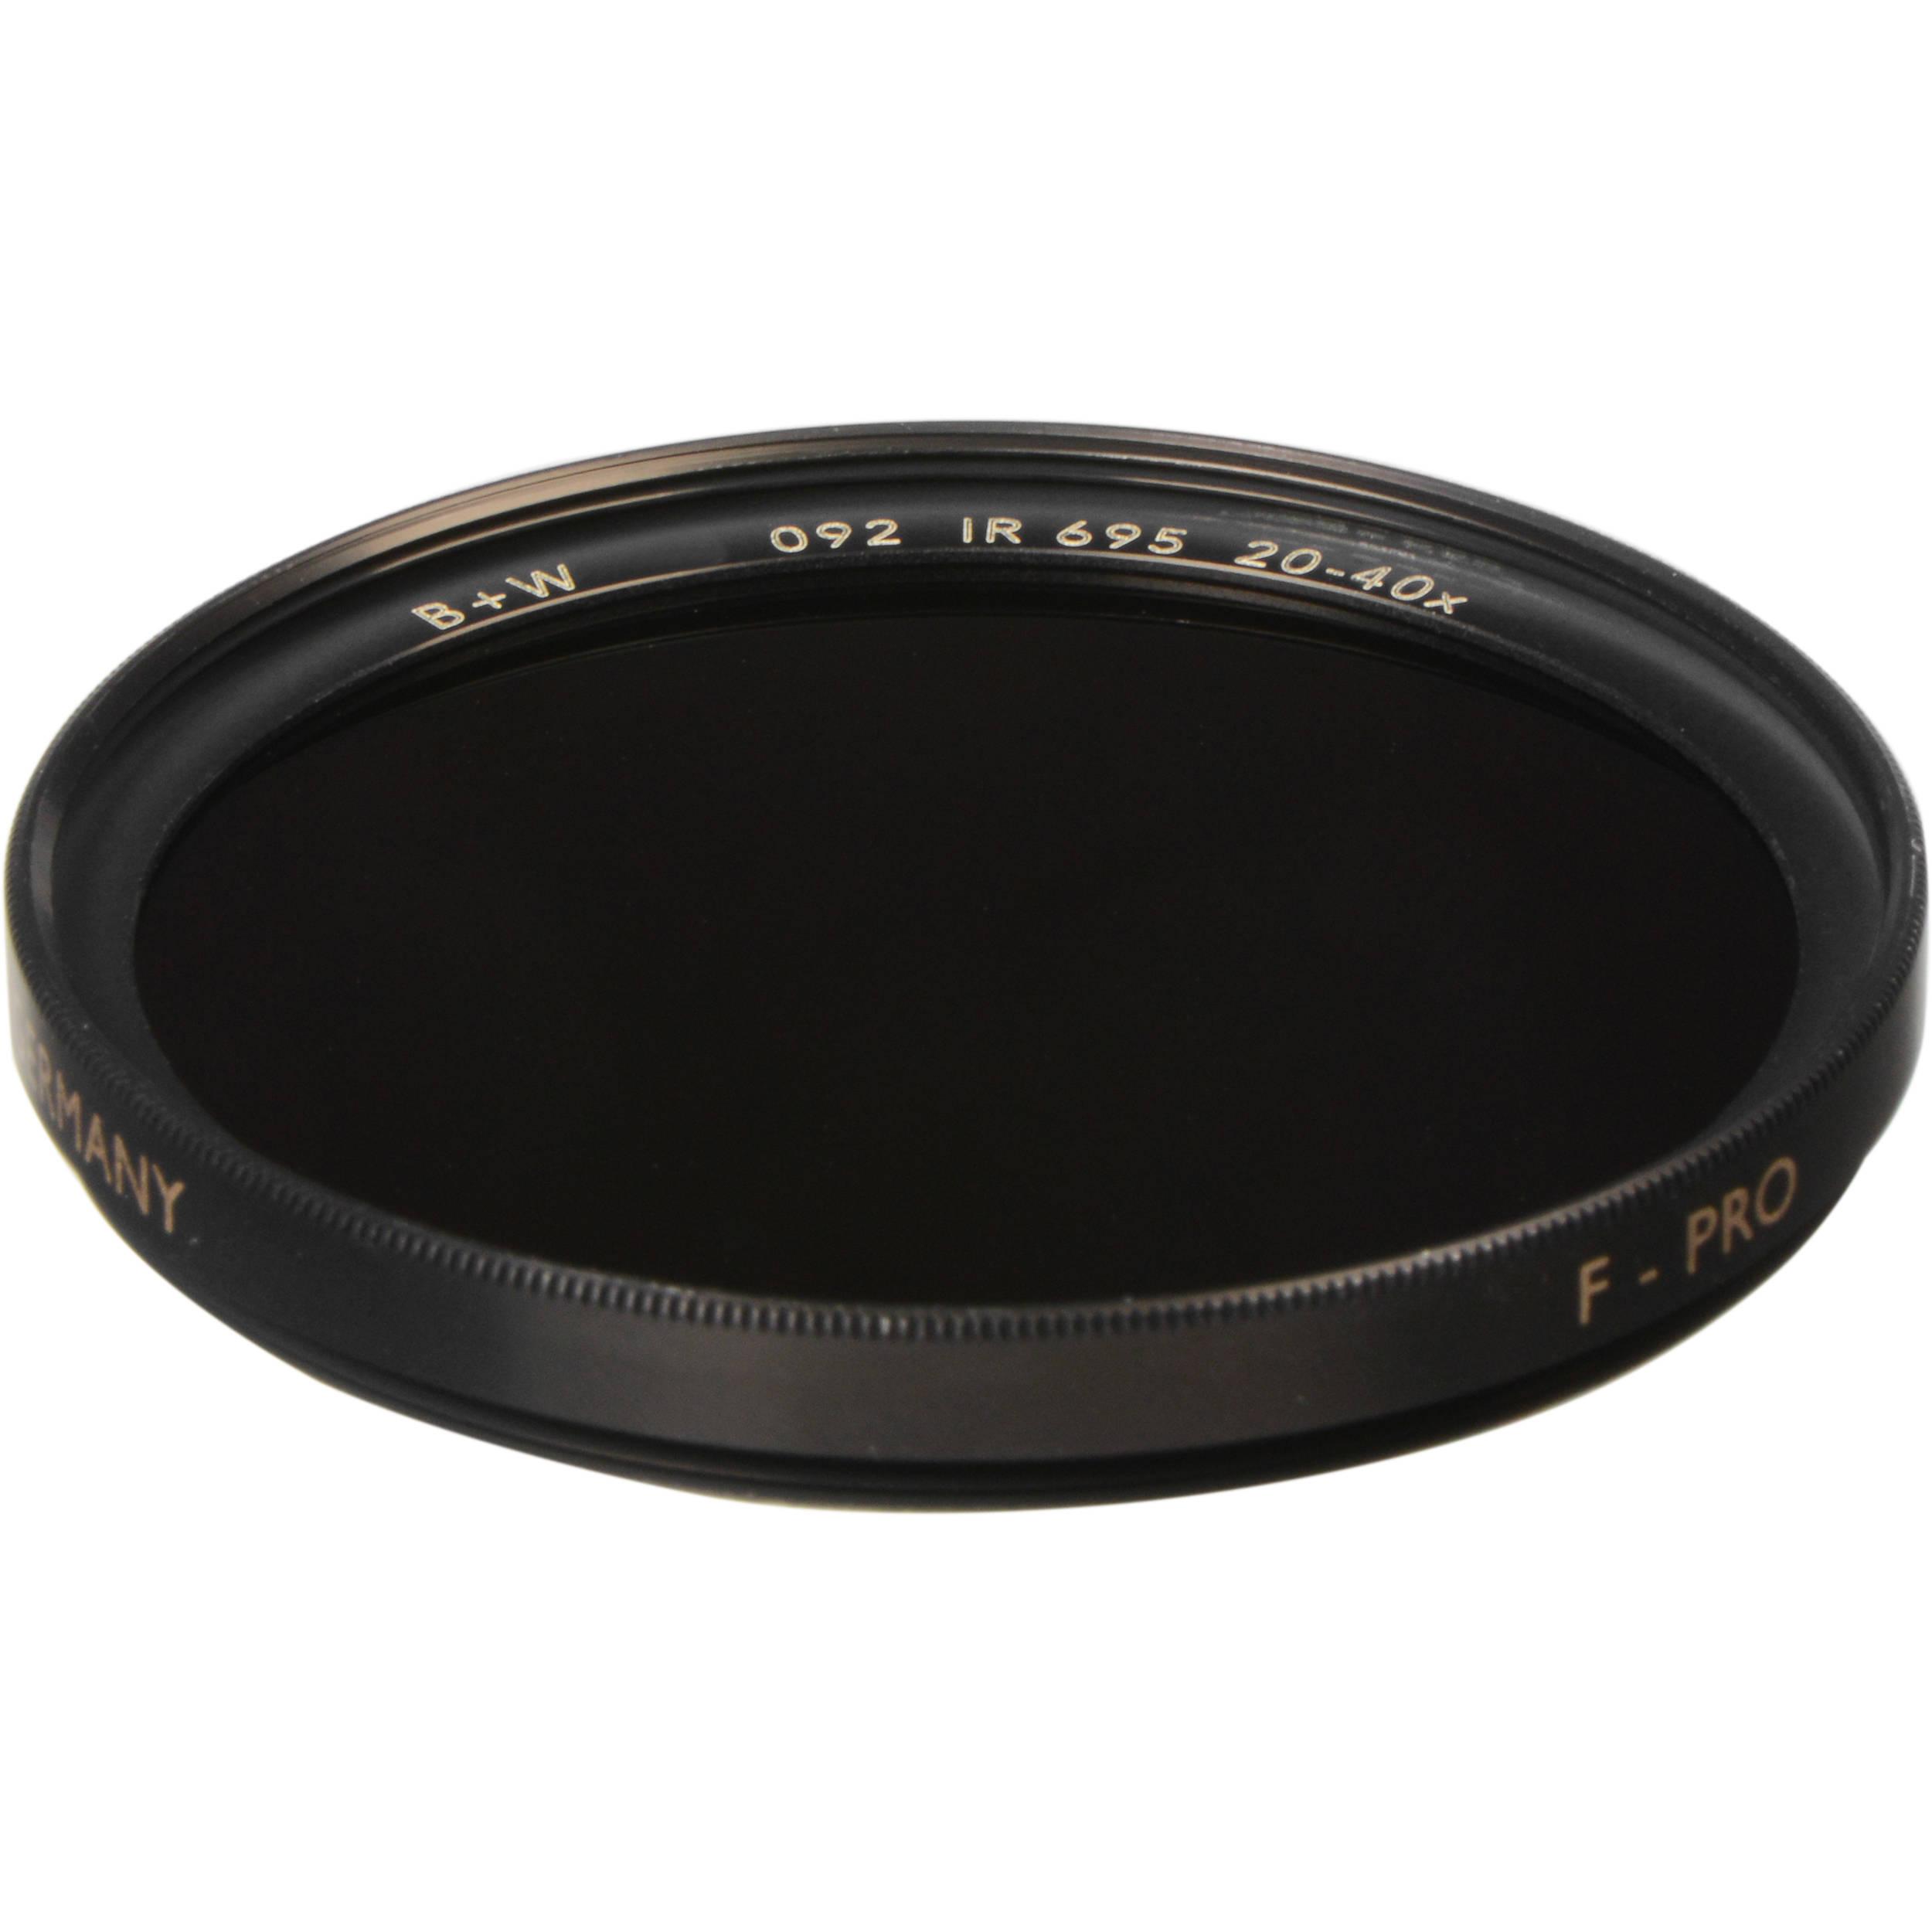 Https C Product 1324679 Reg Jam Tangan 8gb Spy Cam Watch Camera Sport B W 65072271 49mm Infrared Dark Red 7826